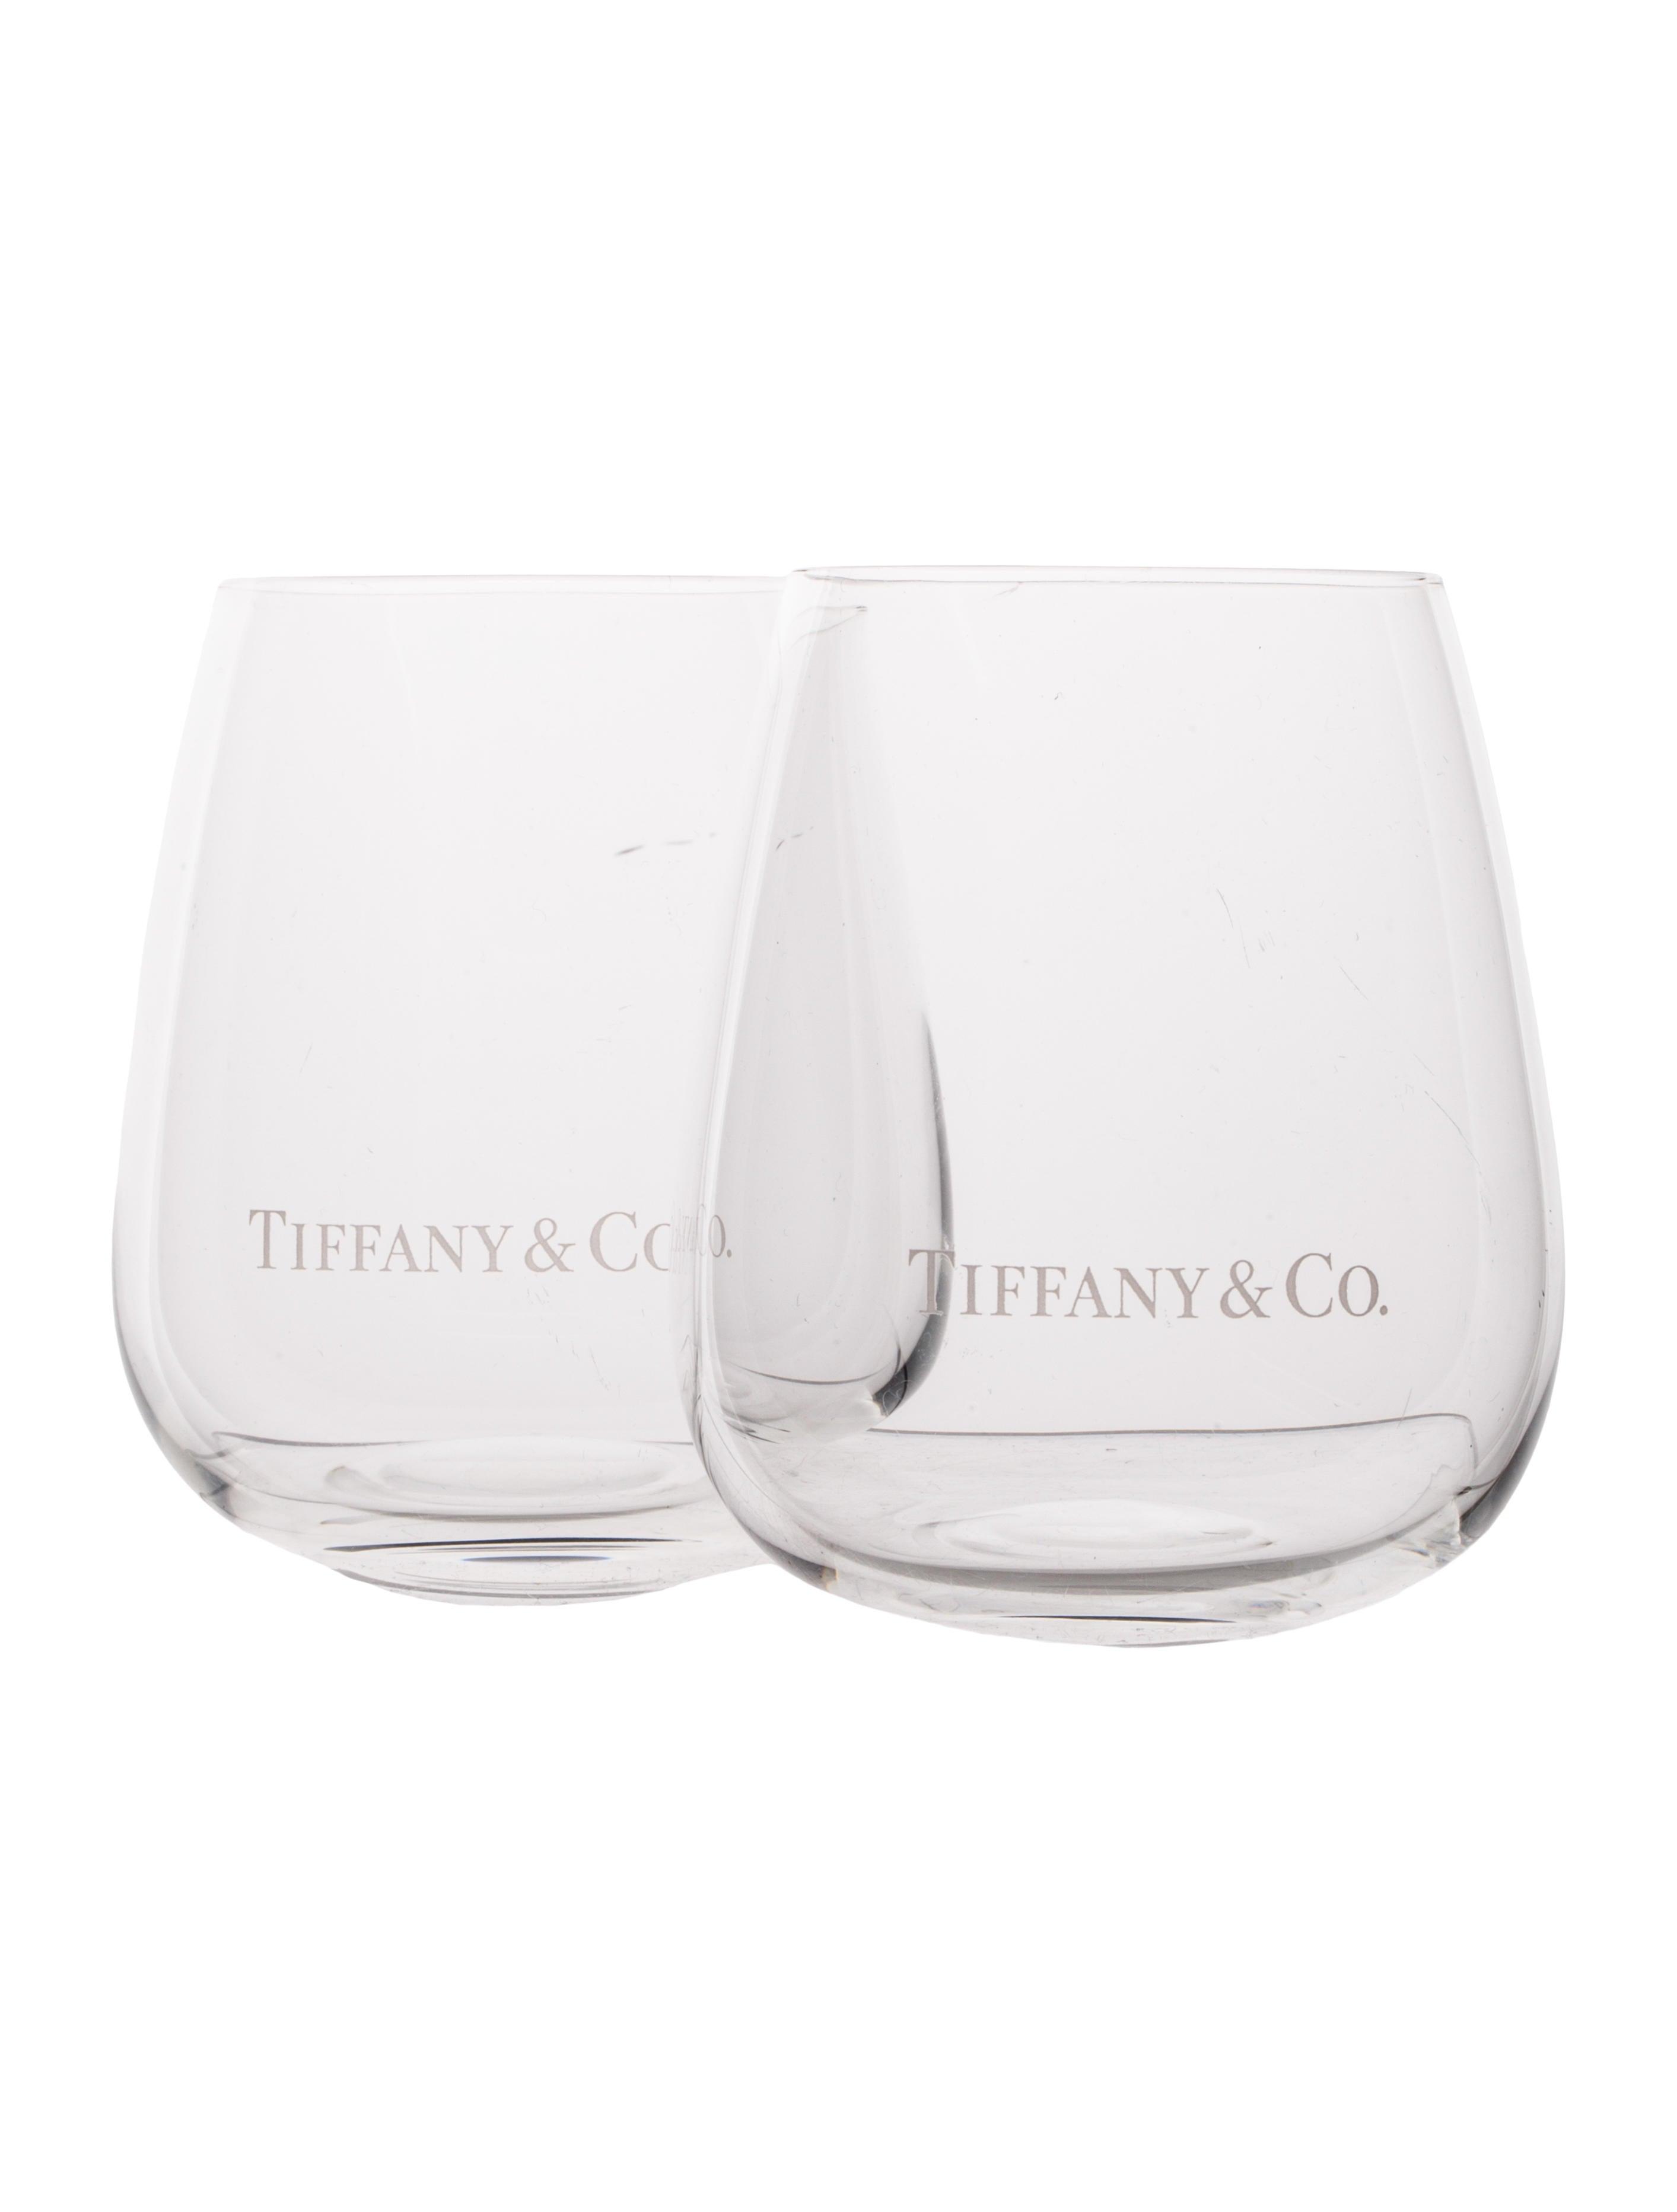 6e21fded506c Tiffany   Co. Stemless Wine Glasses - Tabletop   Kitchen - TIF30794 ...